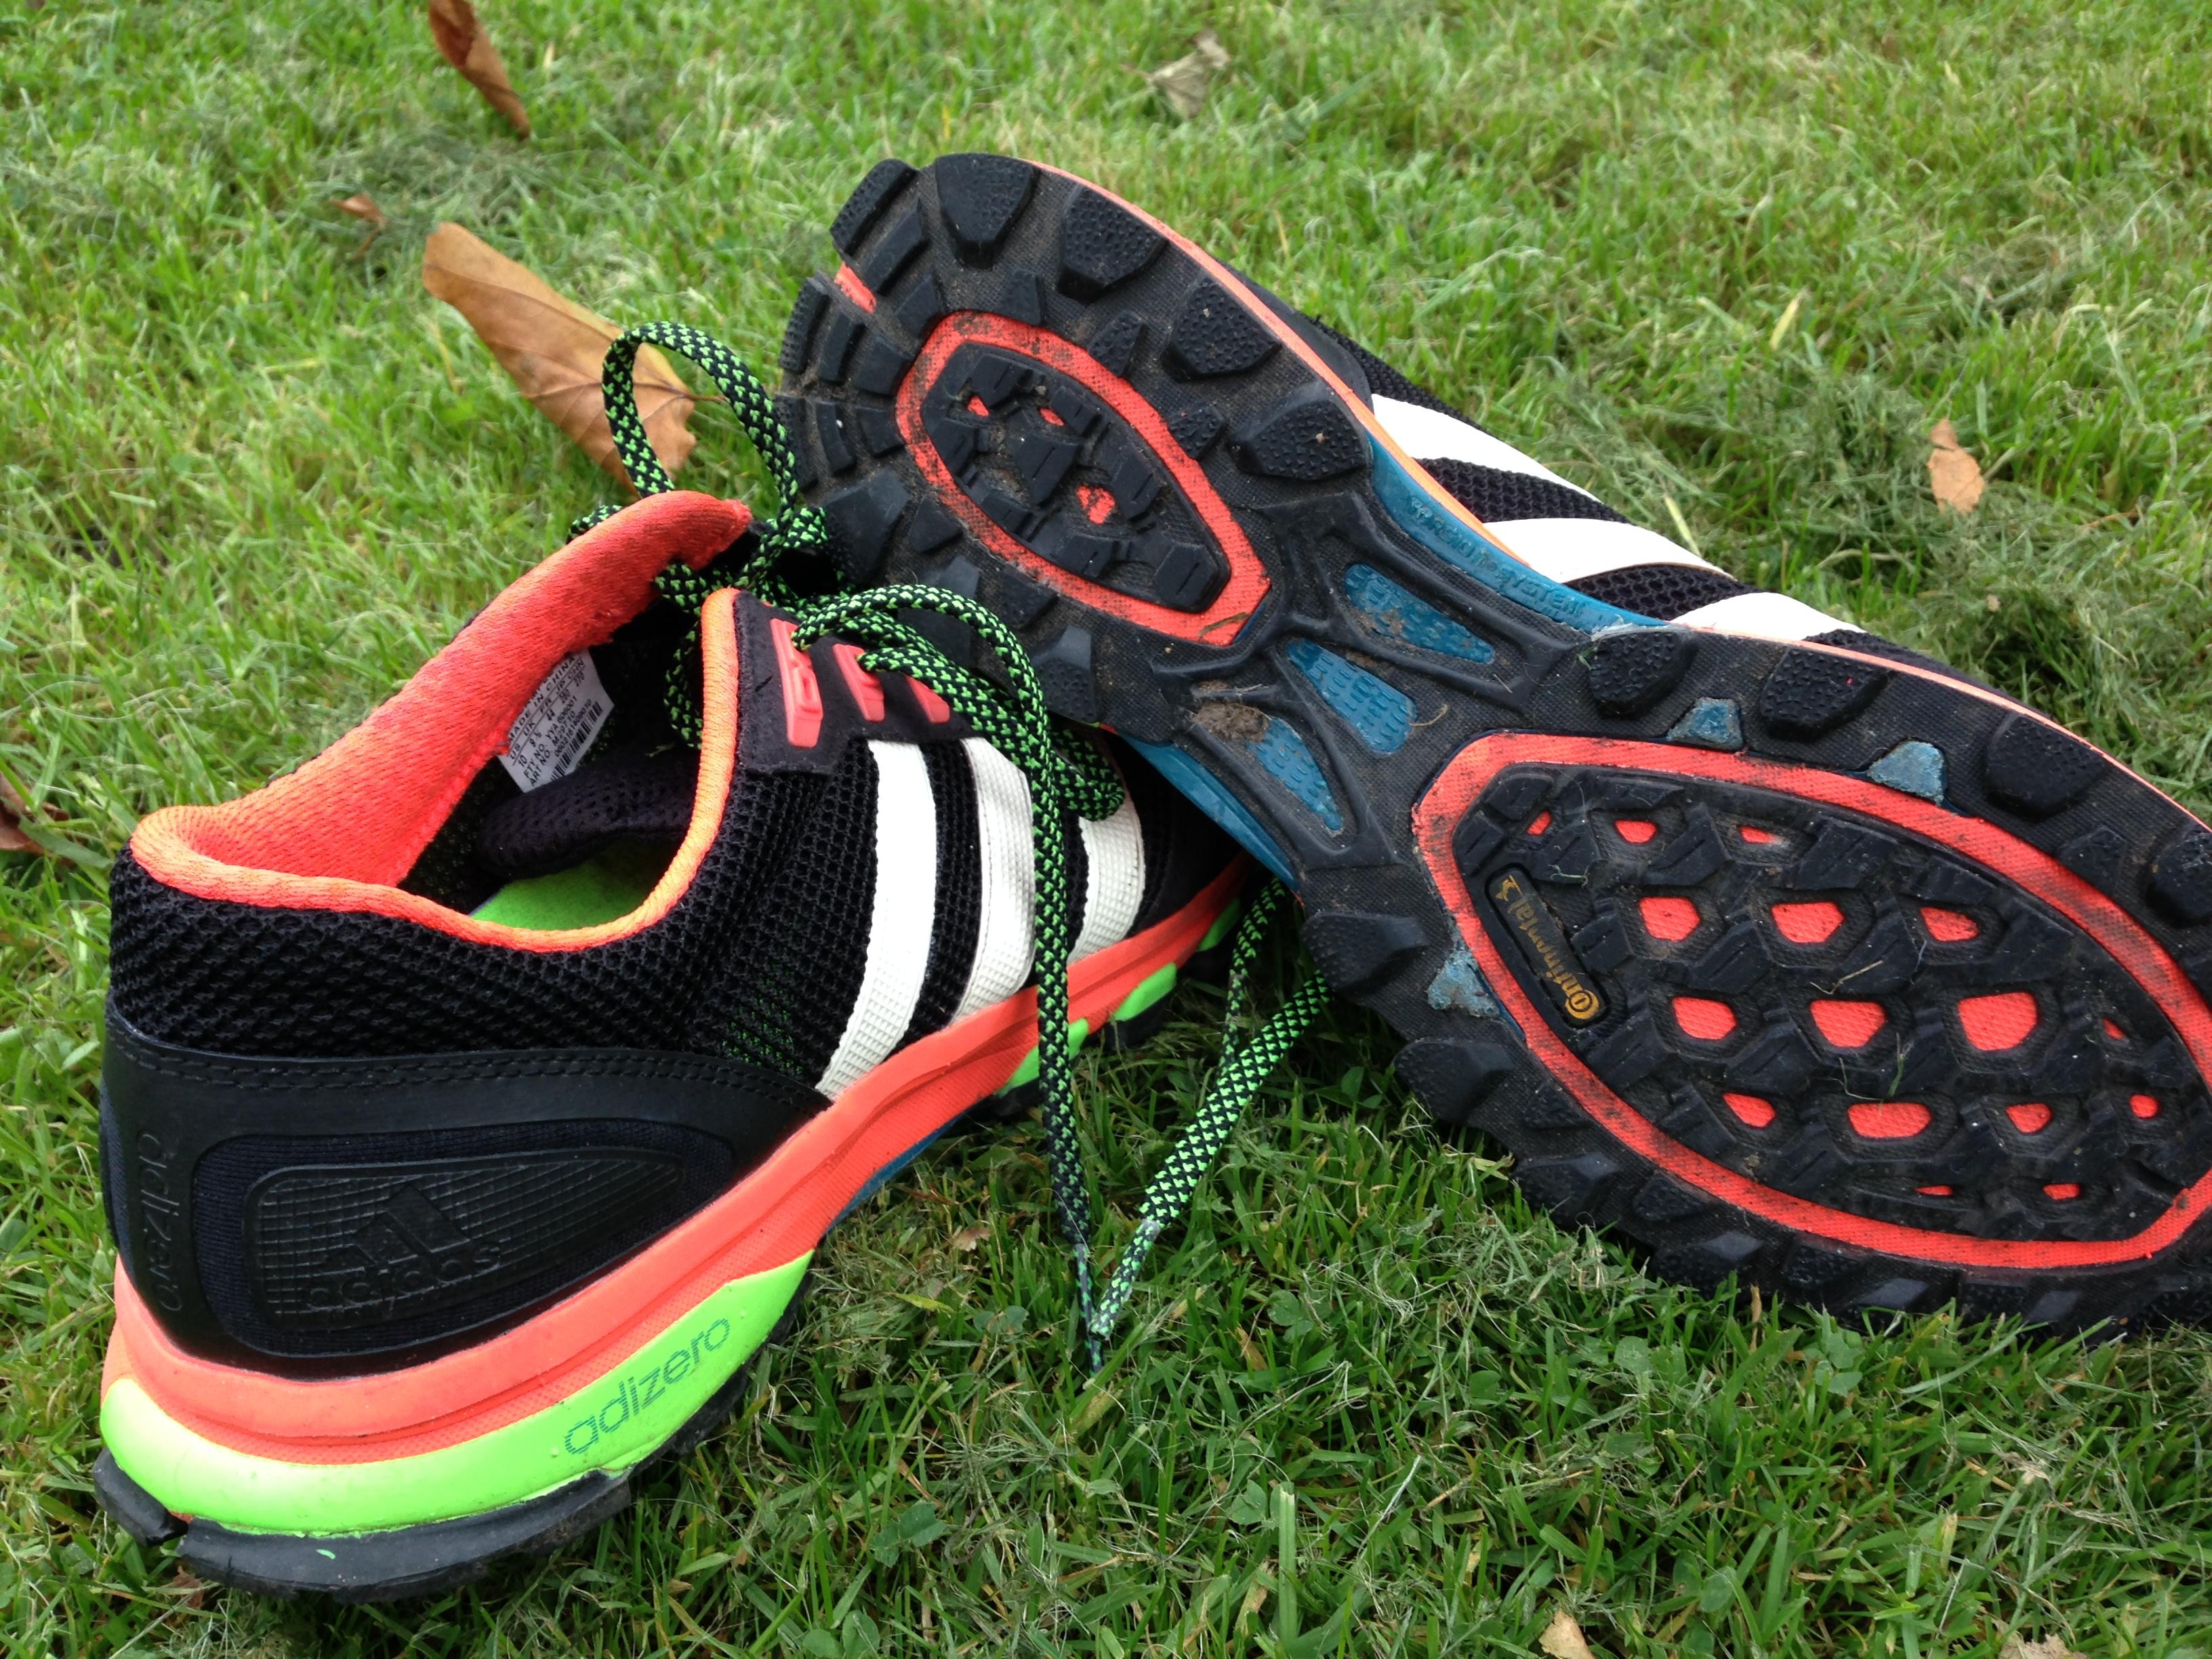 new arrival c7f33 11eb8 ... adidas adiZero XT 5 trail running shoes. IMG 0225 1